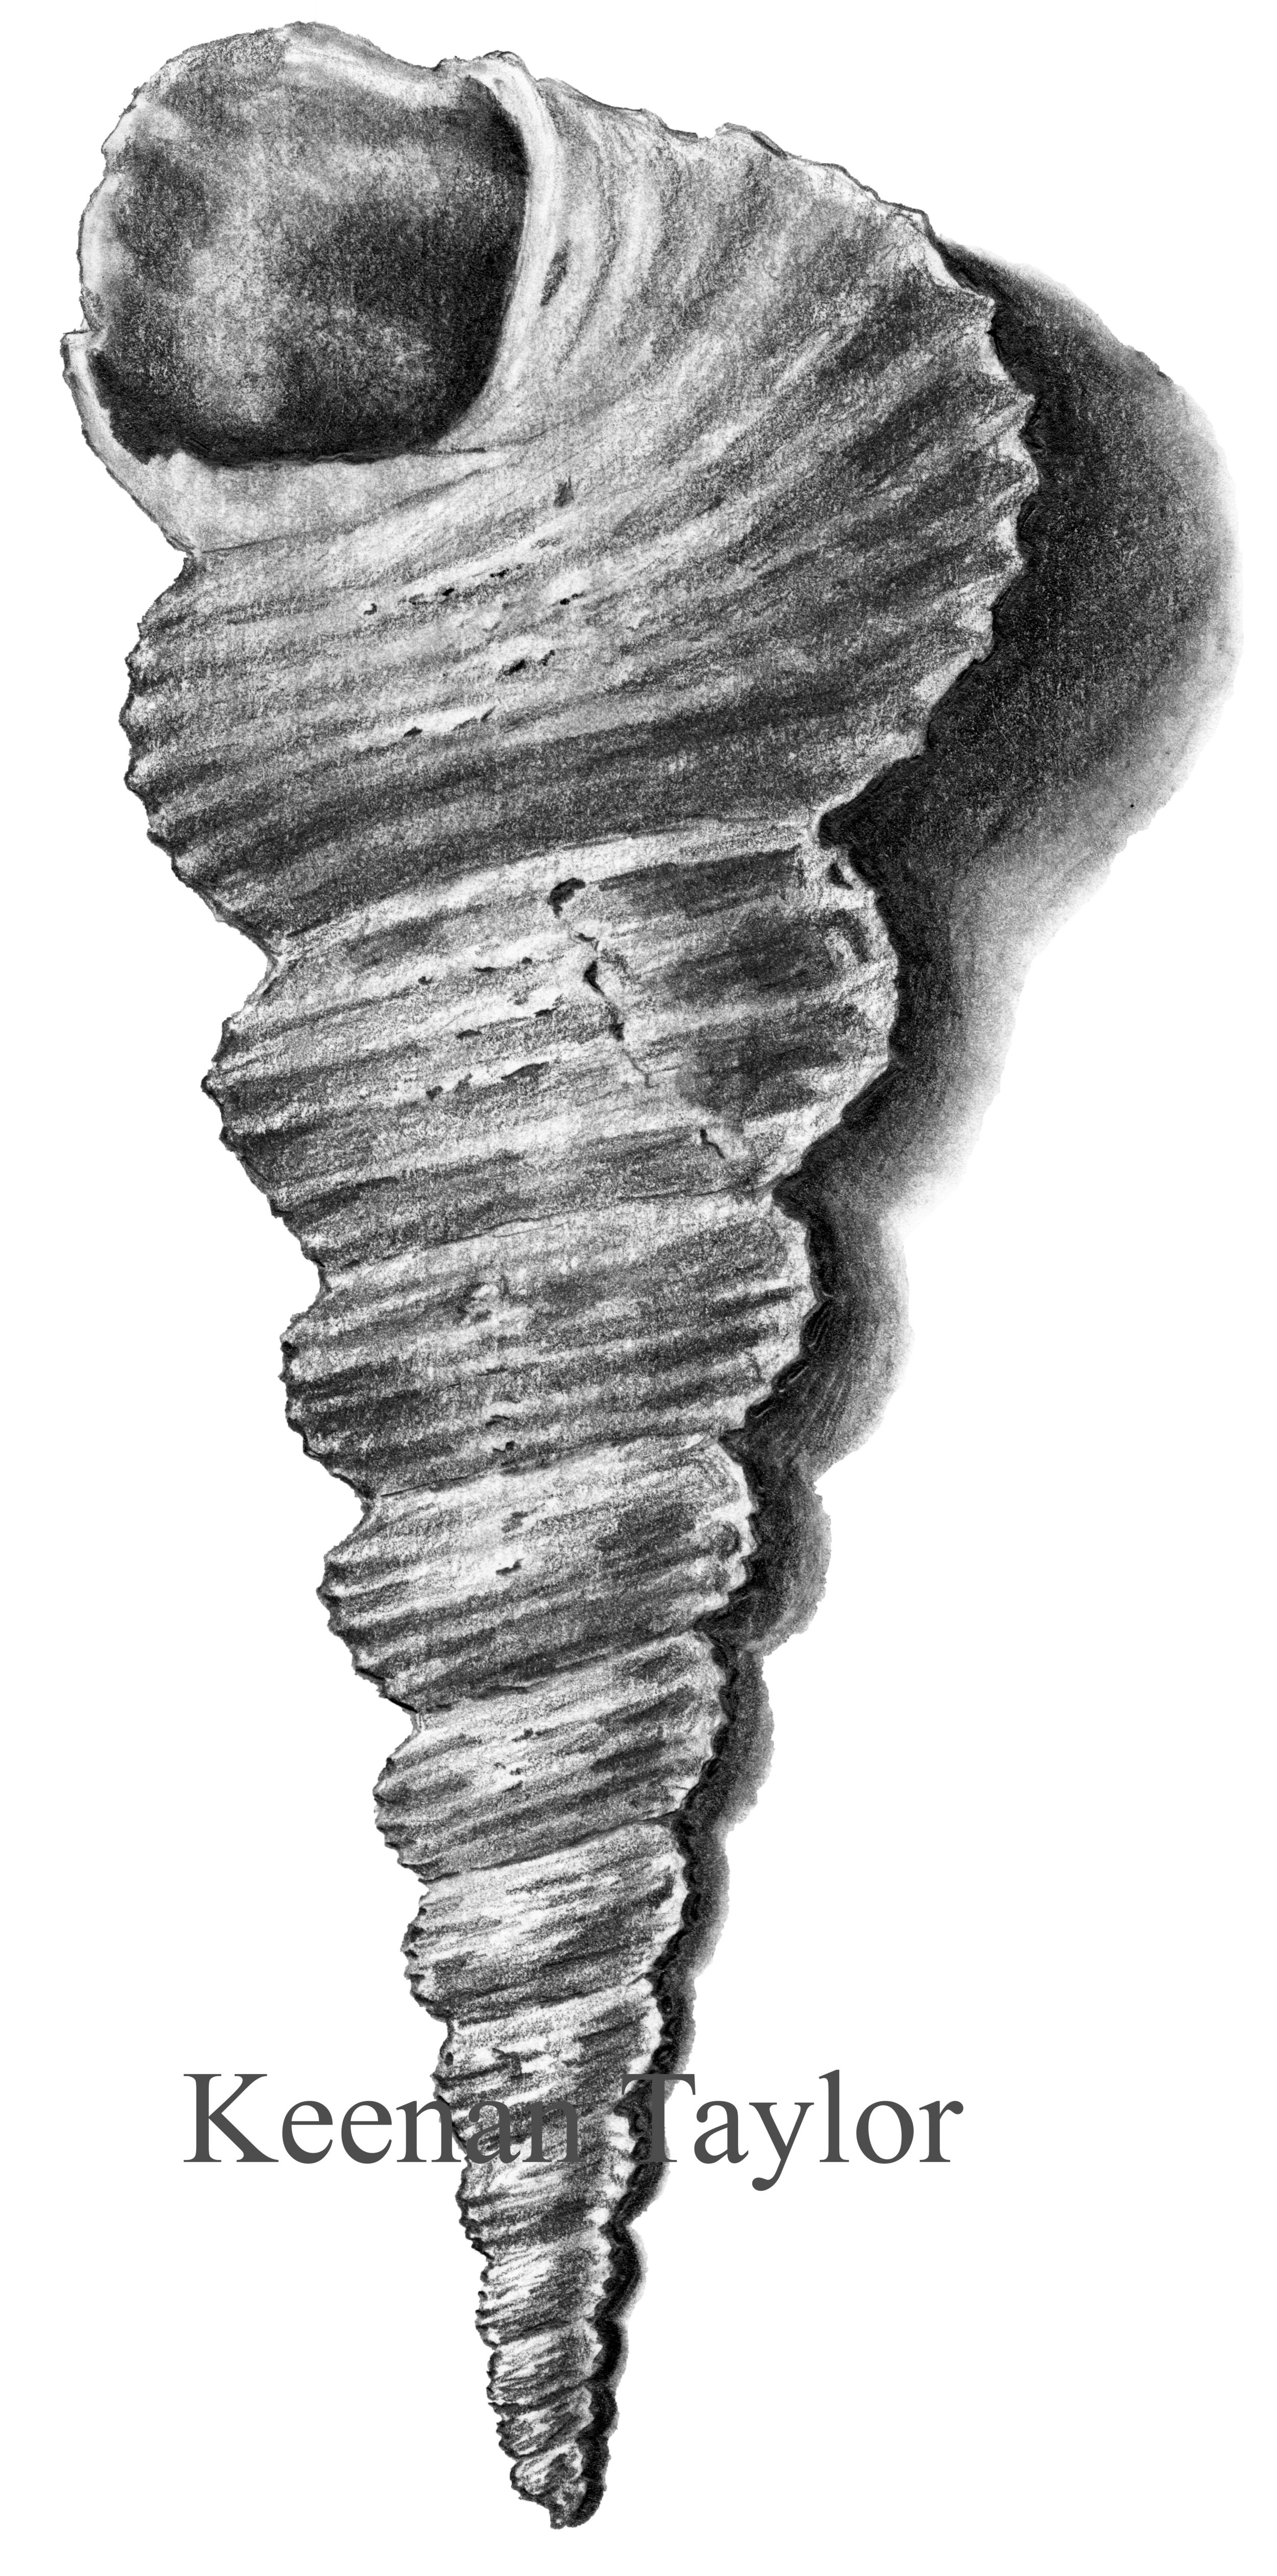 Tower Snail (Turritella communis)